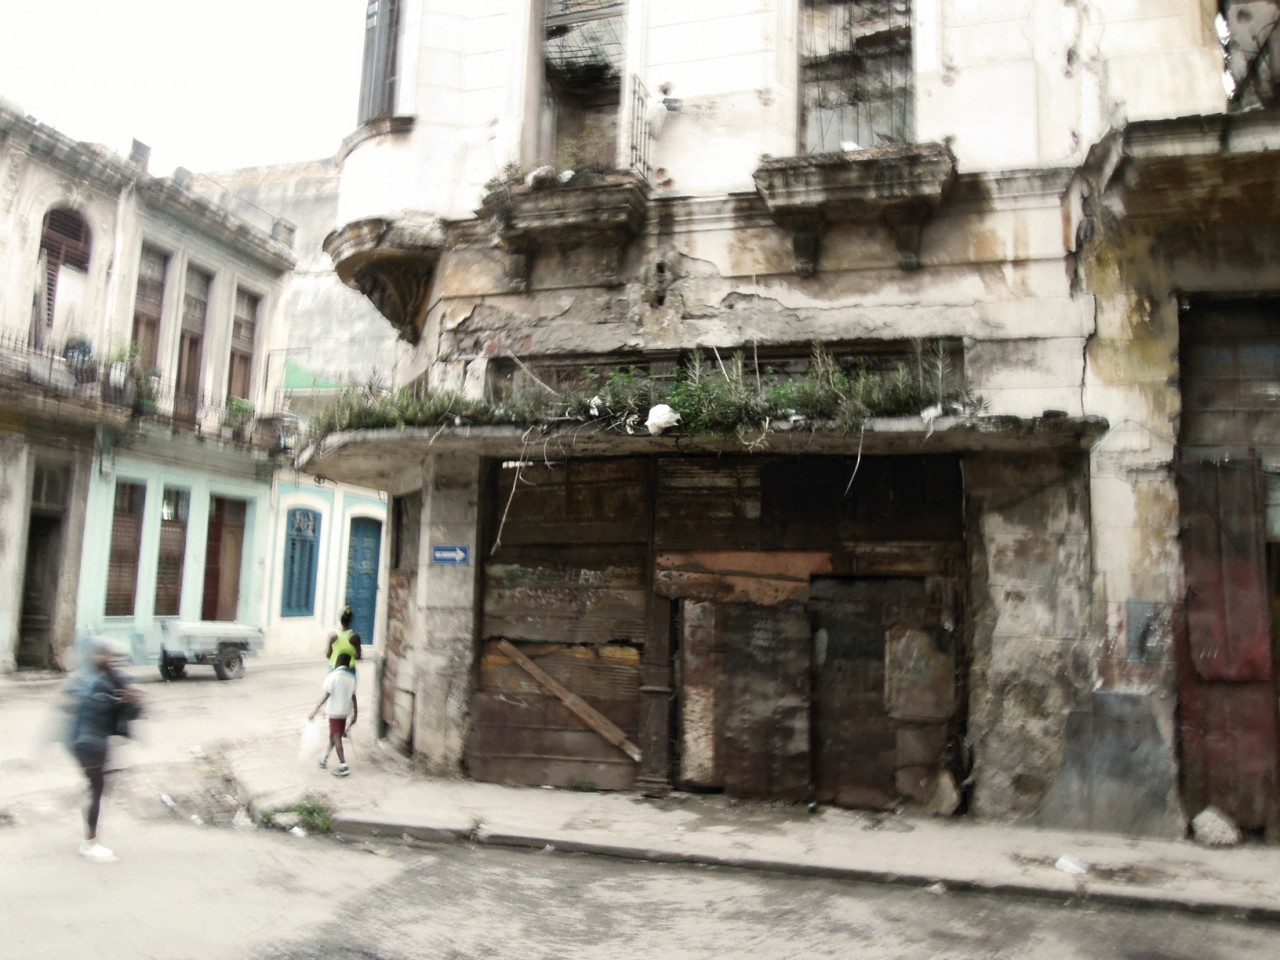 Havana, Cuba. November 2014.